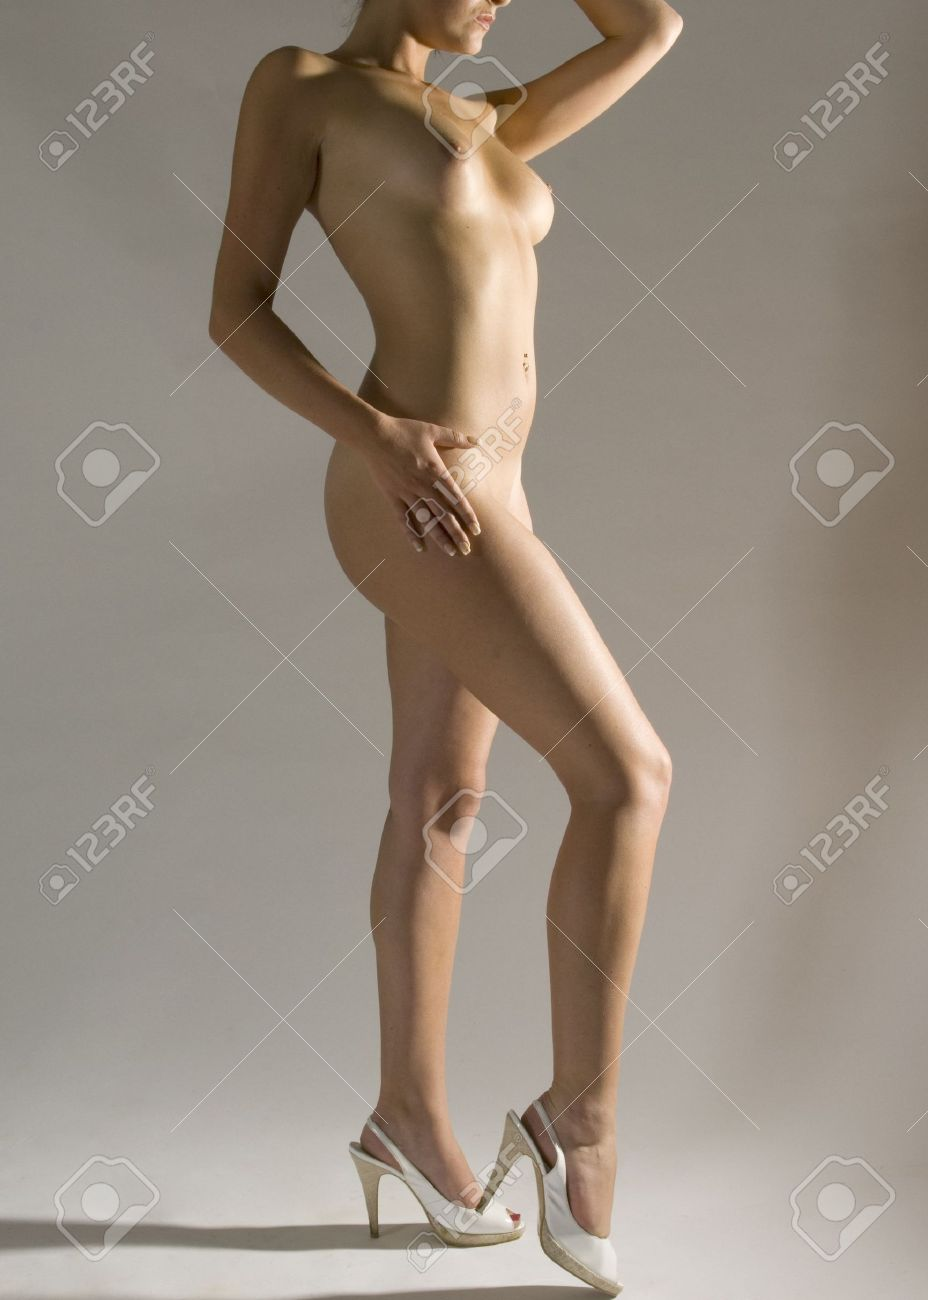 Beautiful nude women standing